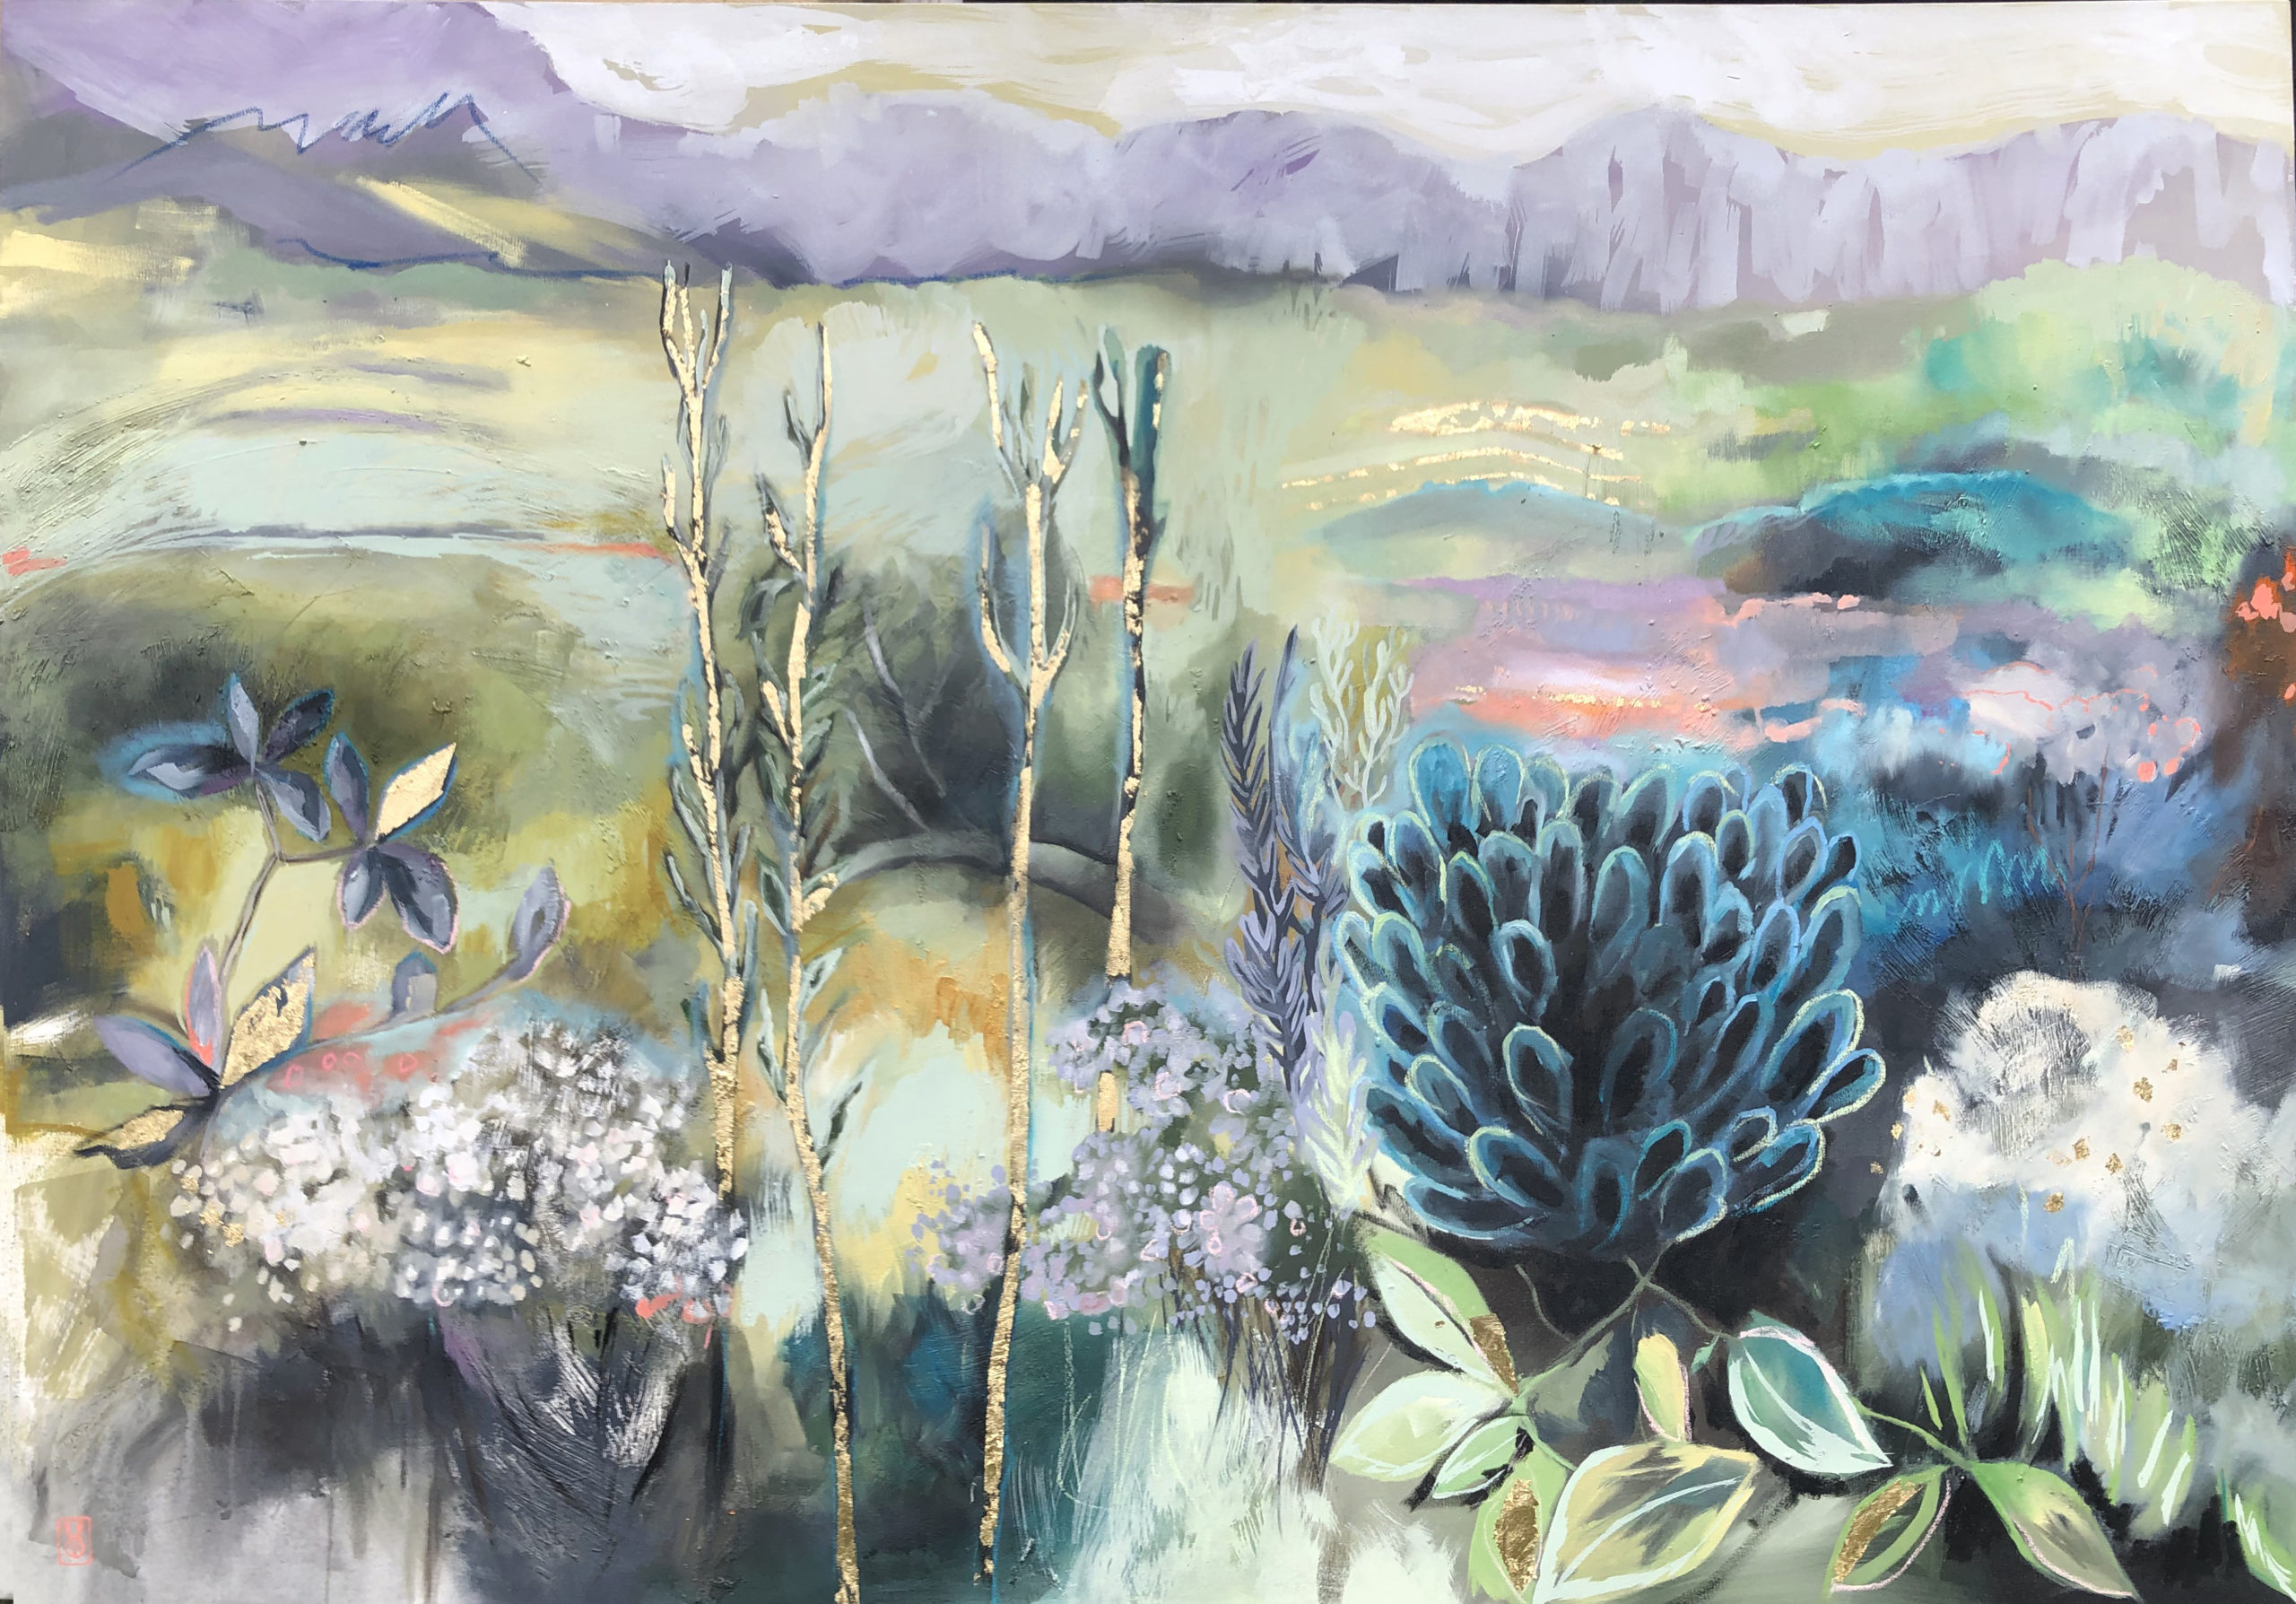 Vicky Sanders Abstract Botanical - Fynbos